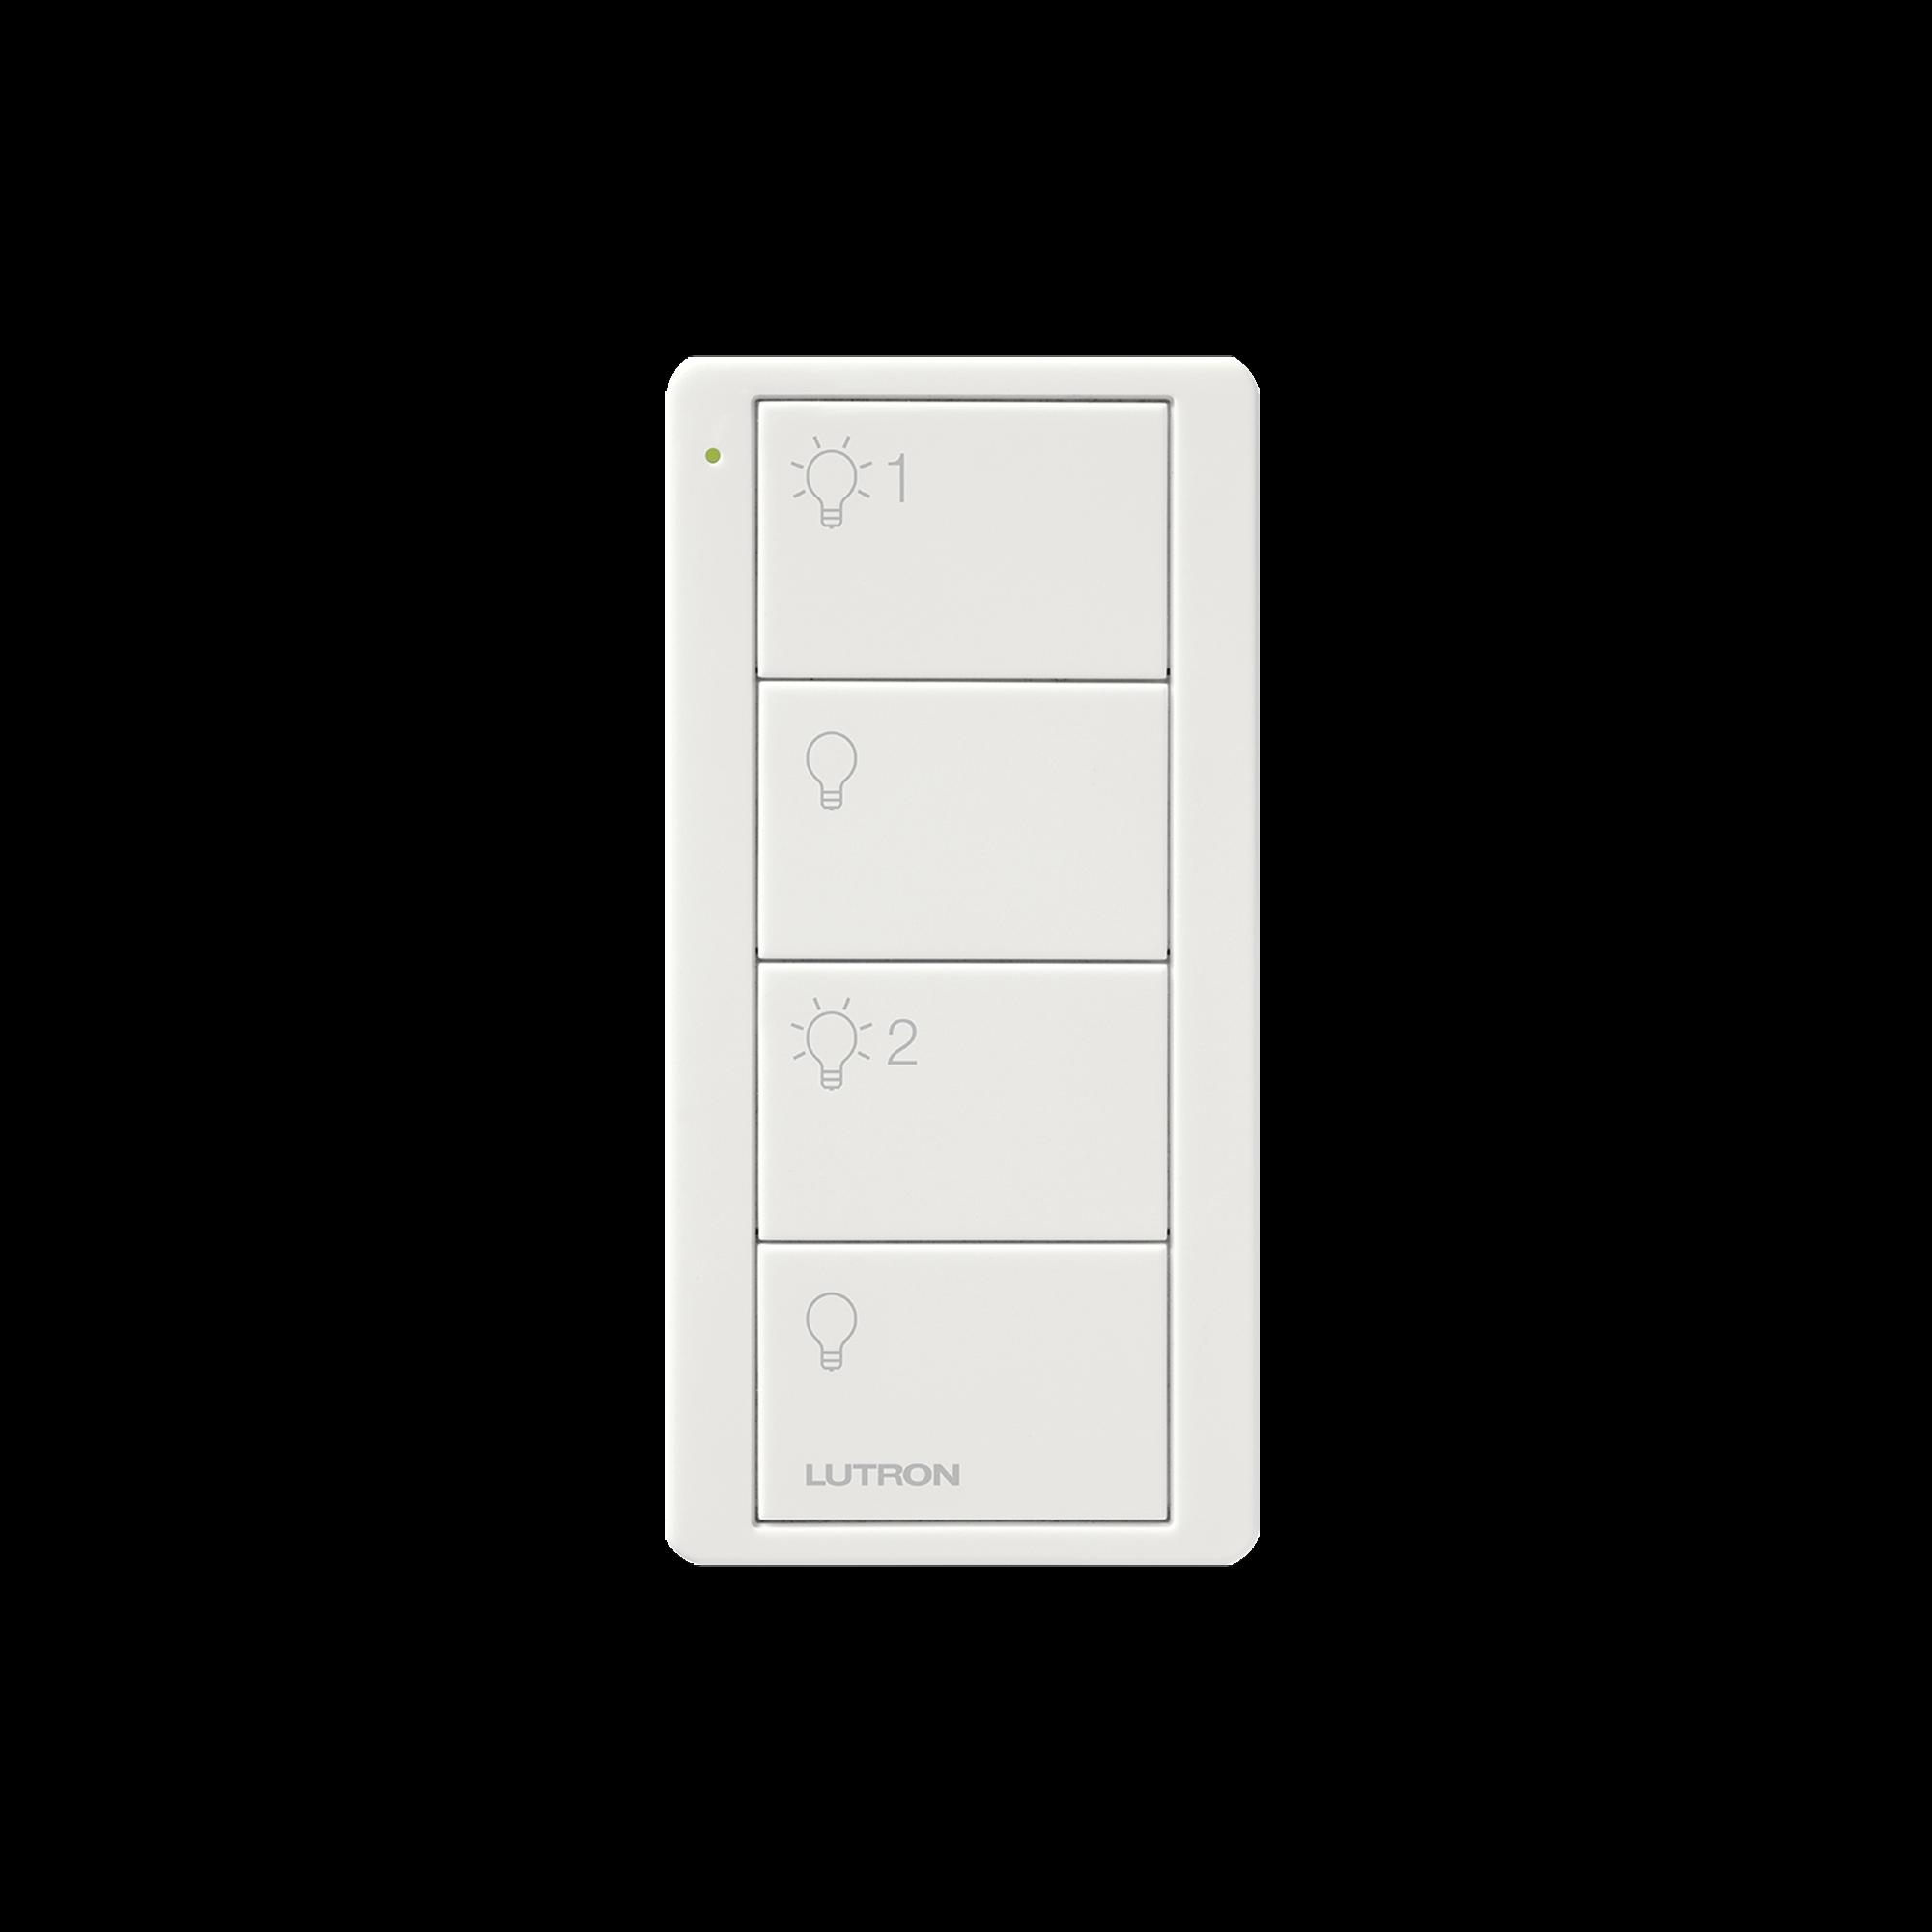 Control PICO 4 botones, 2 grupos, complemente con un atenuador o switch on/off